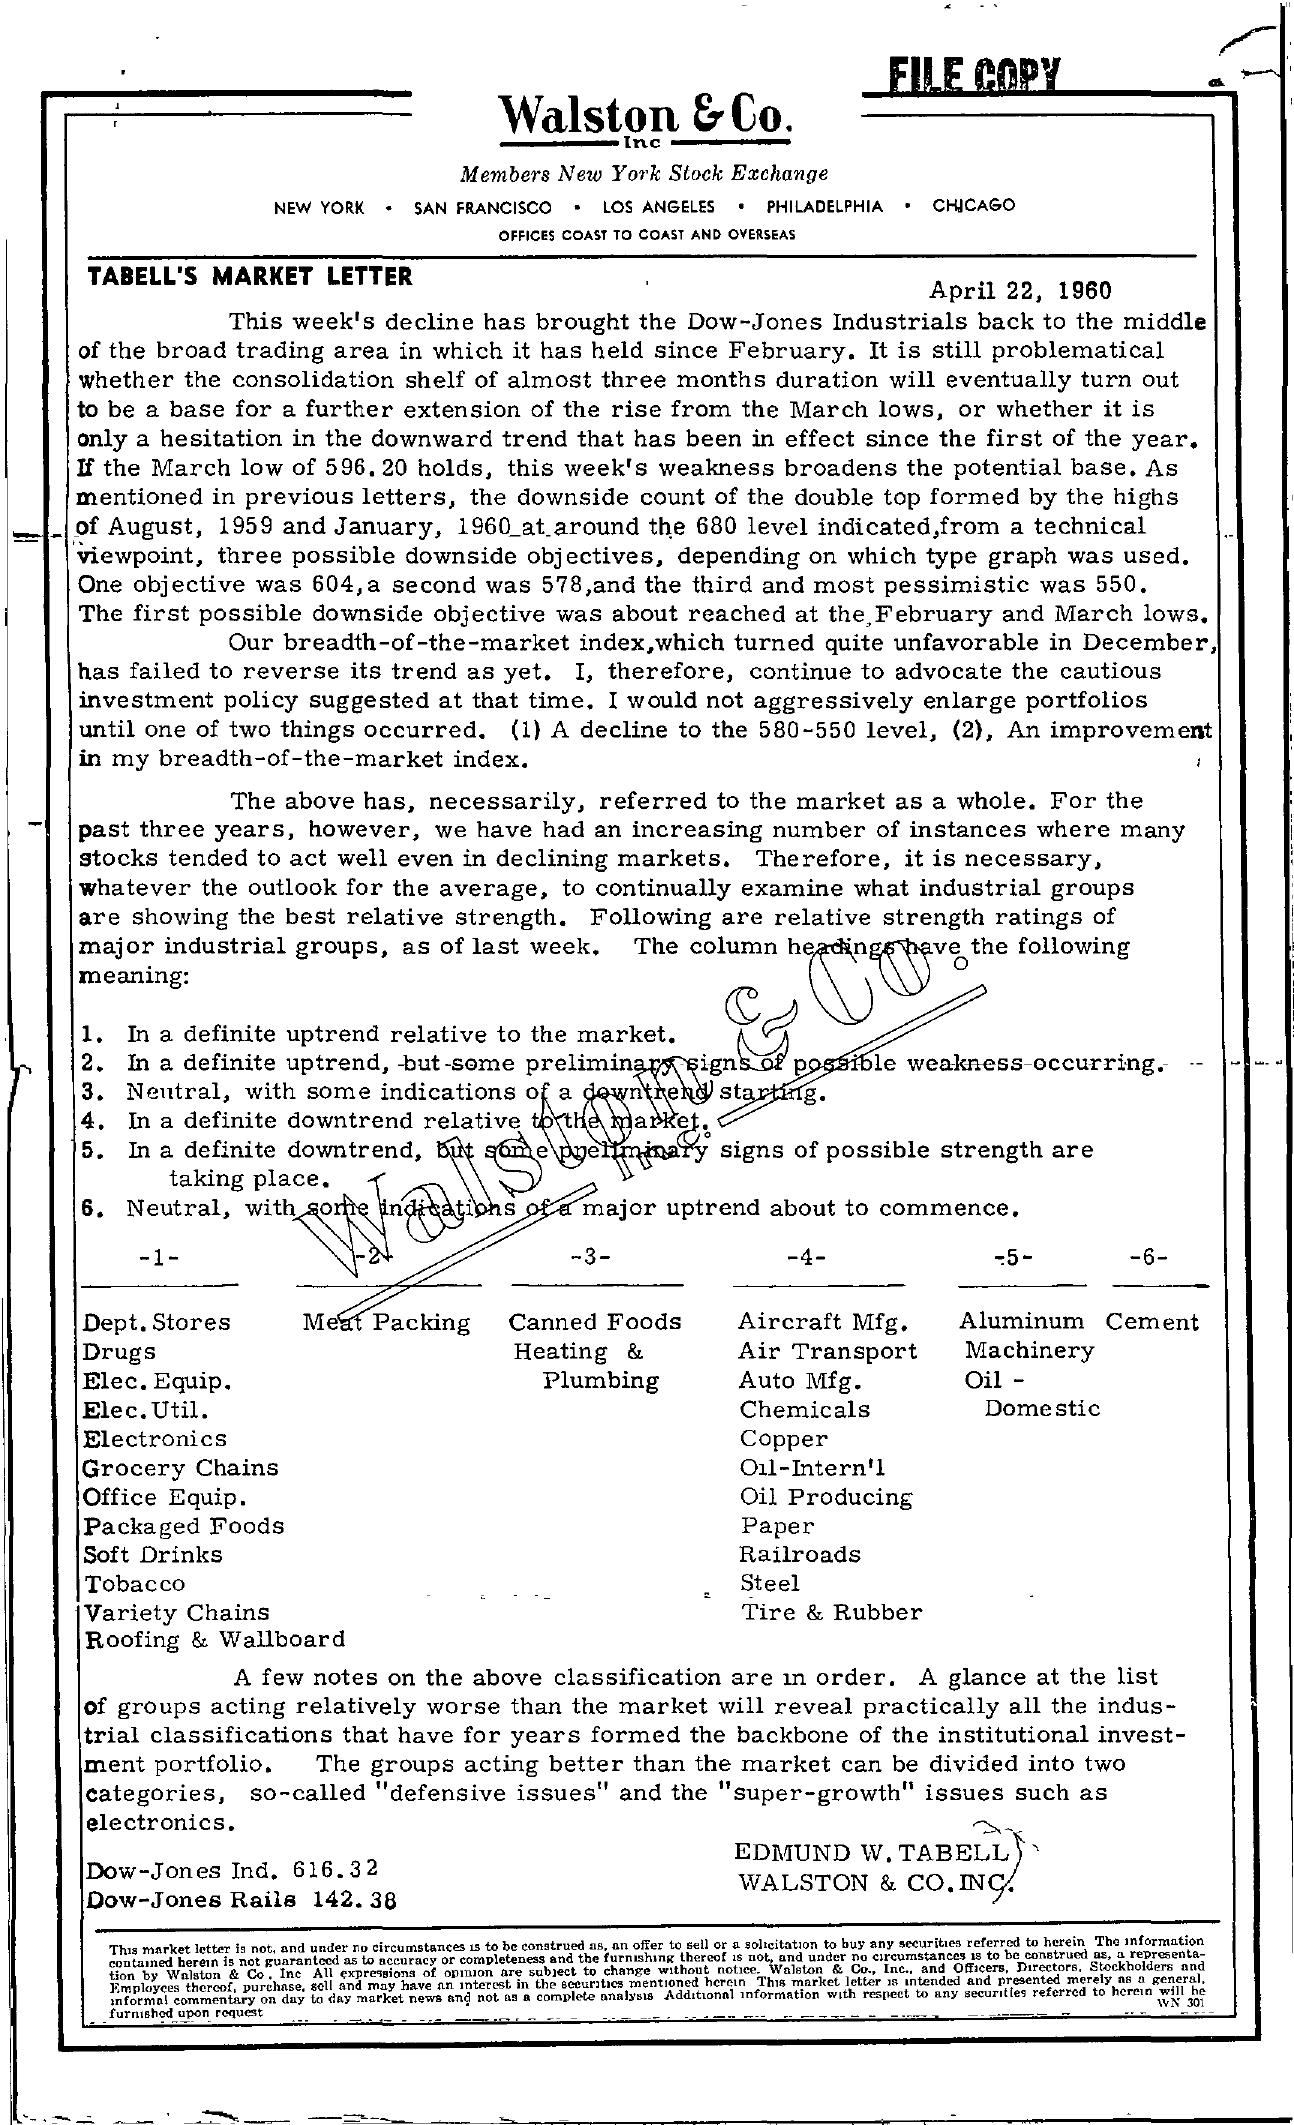 Tabell's Market Letter - April 22, 1960